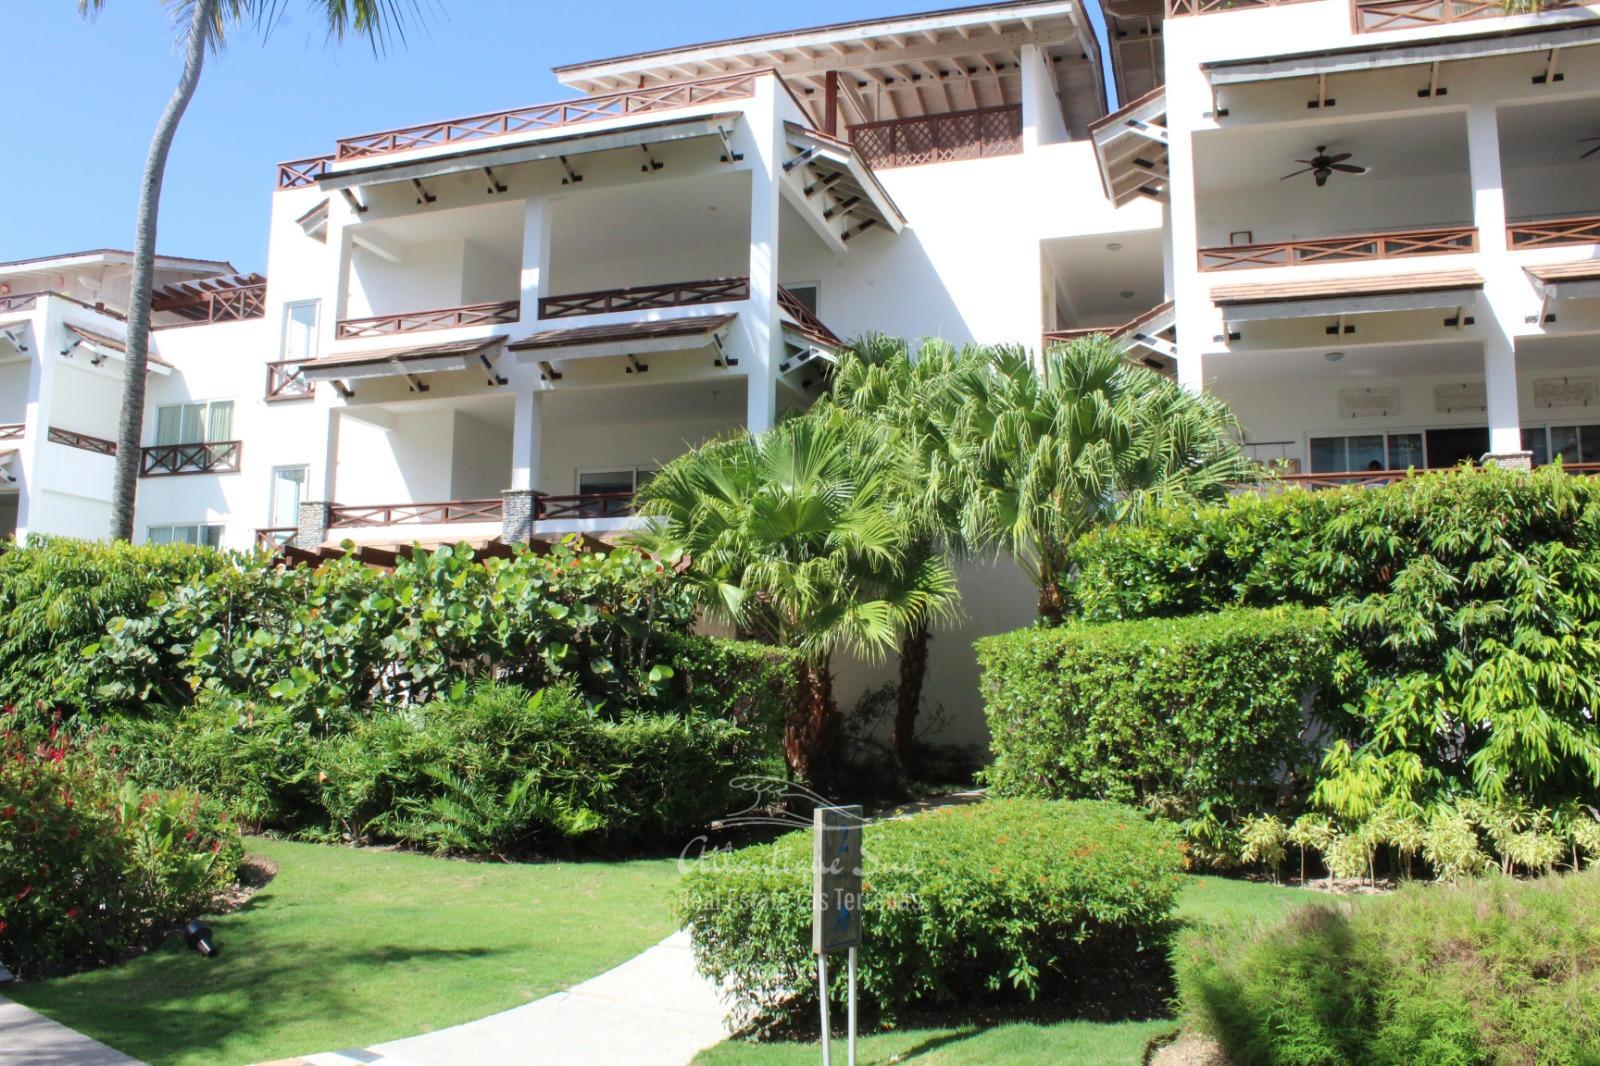 Apartments near the beach real estate las terrenas dominican republic42.jpg